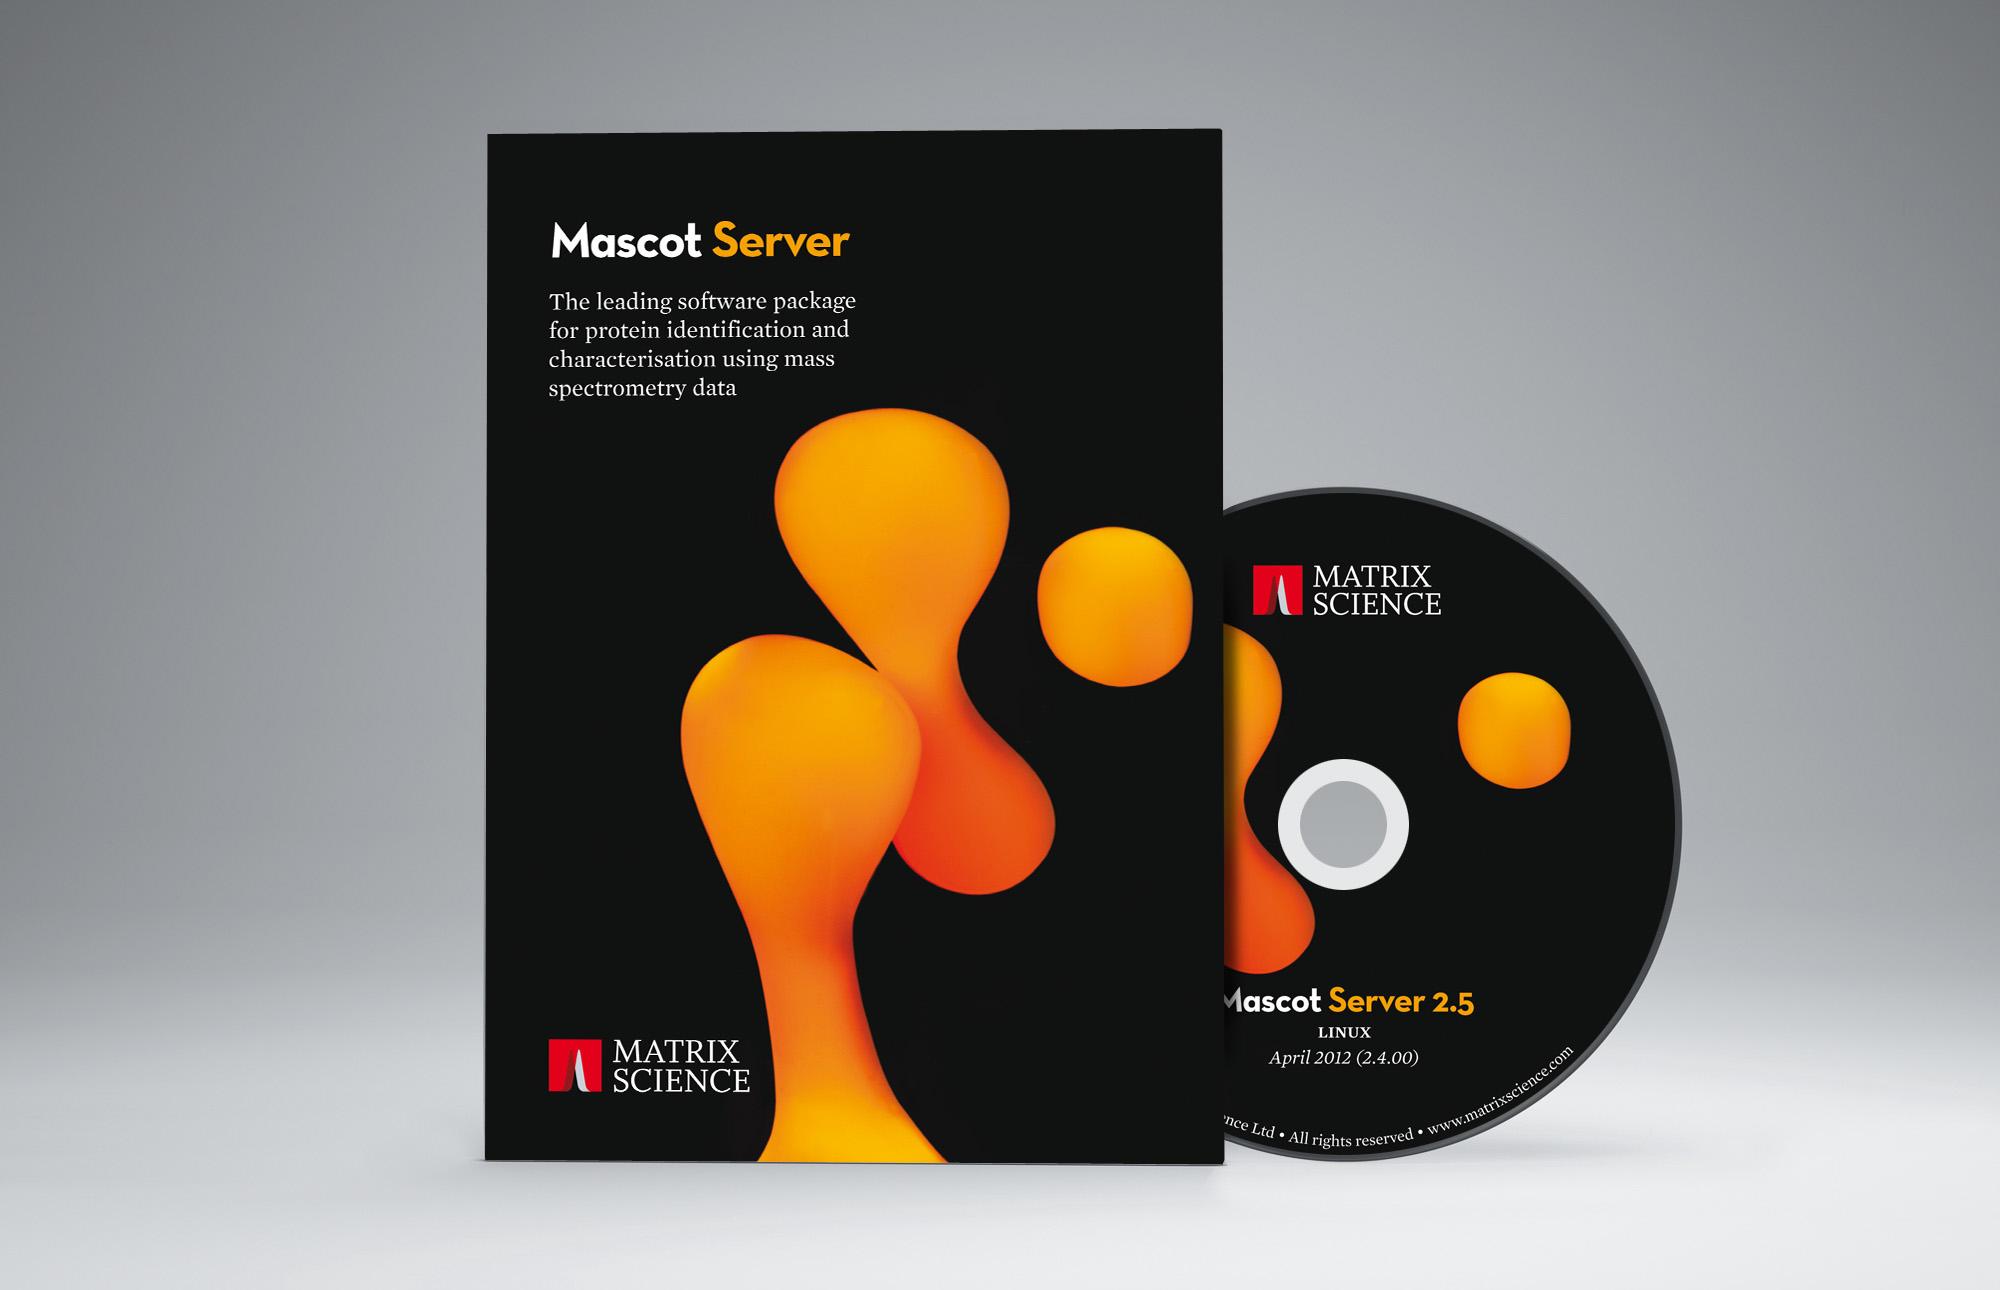 Matrix Mascot Server packaging design